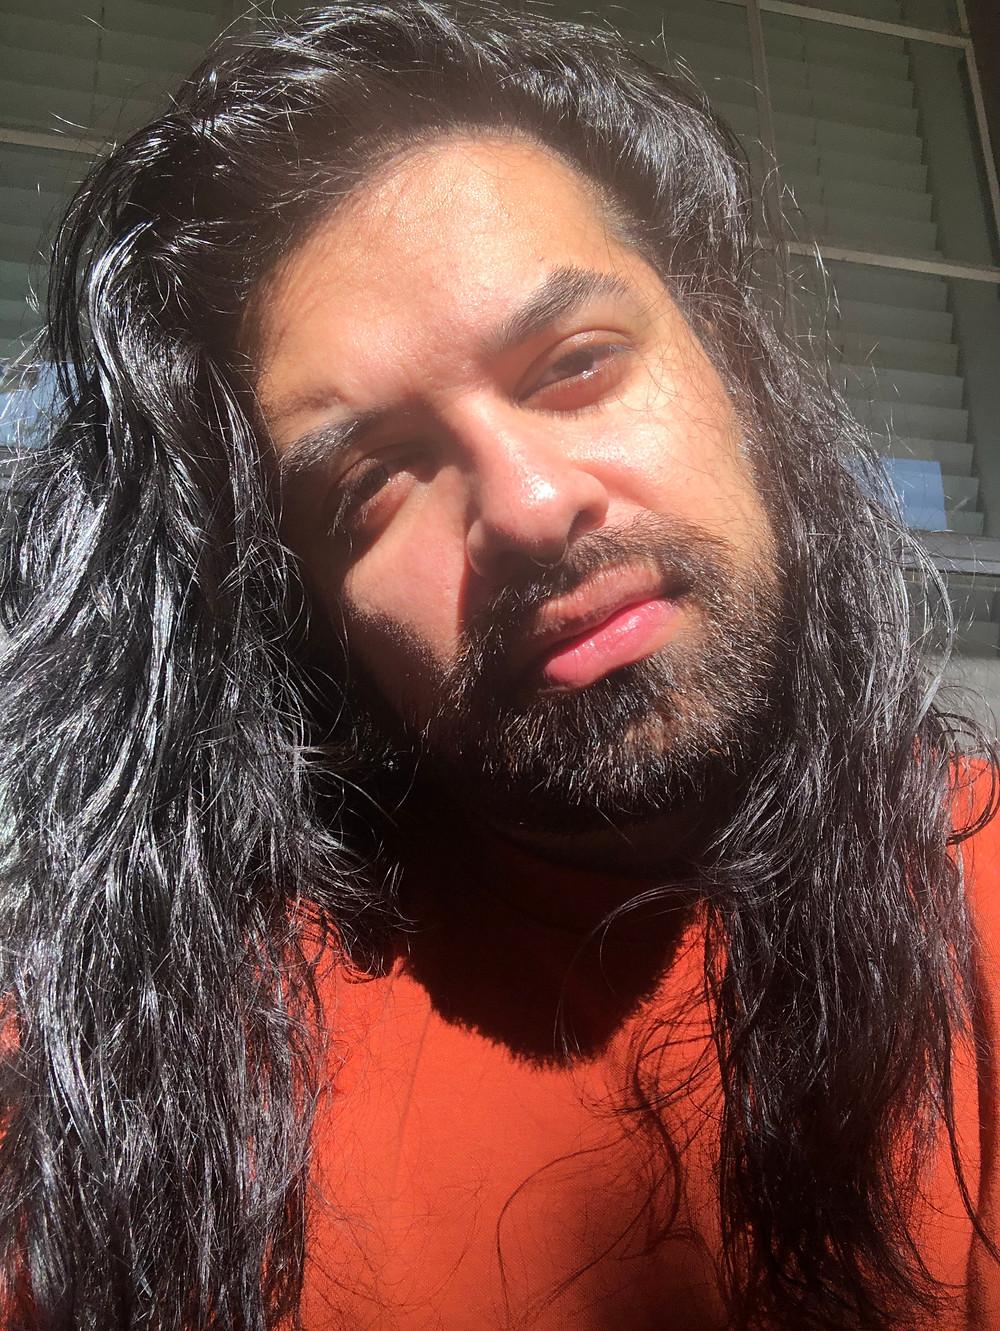 Uliya with long black hair and an burnt orange shirt